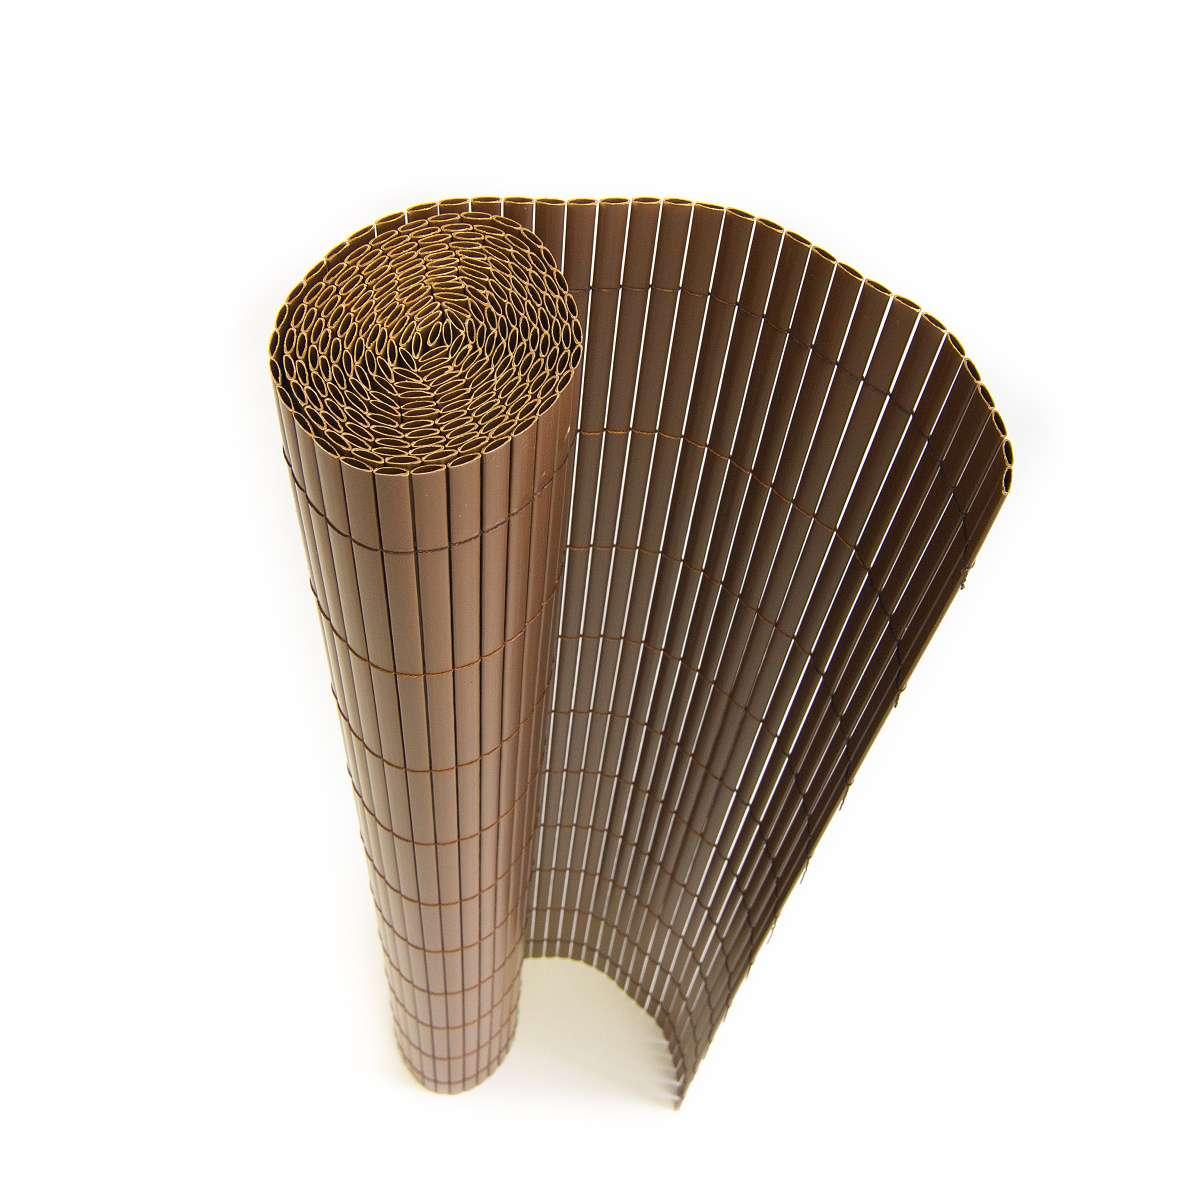 Bambusová rohož - BAMBOO MAT - B, výška 1,0 m